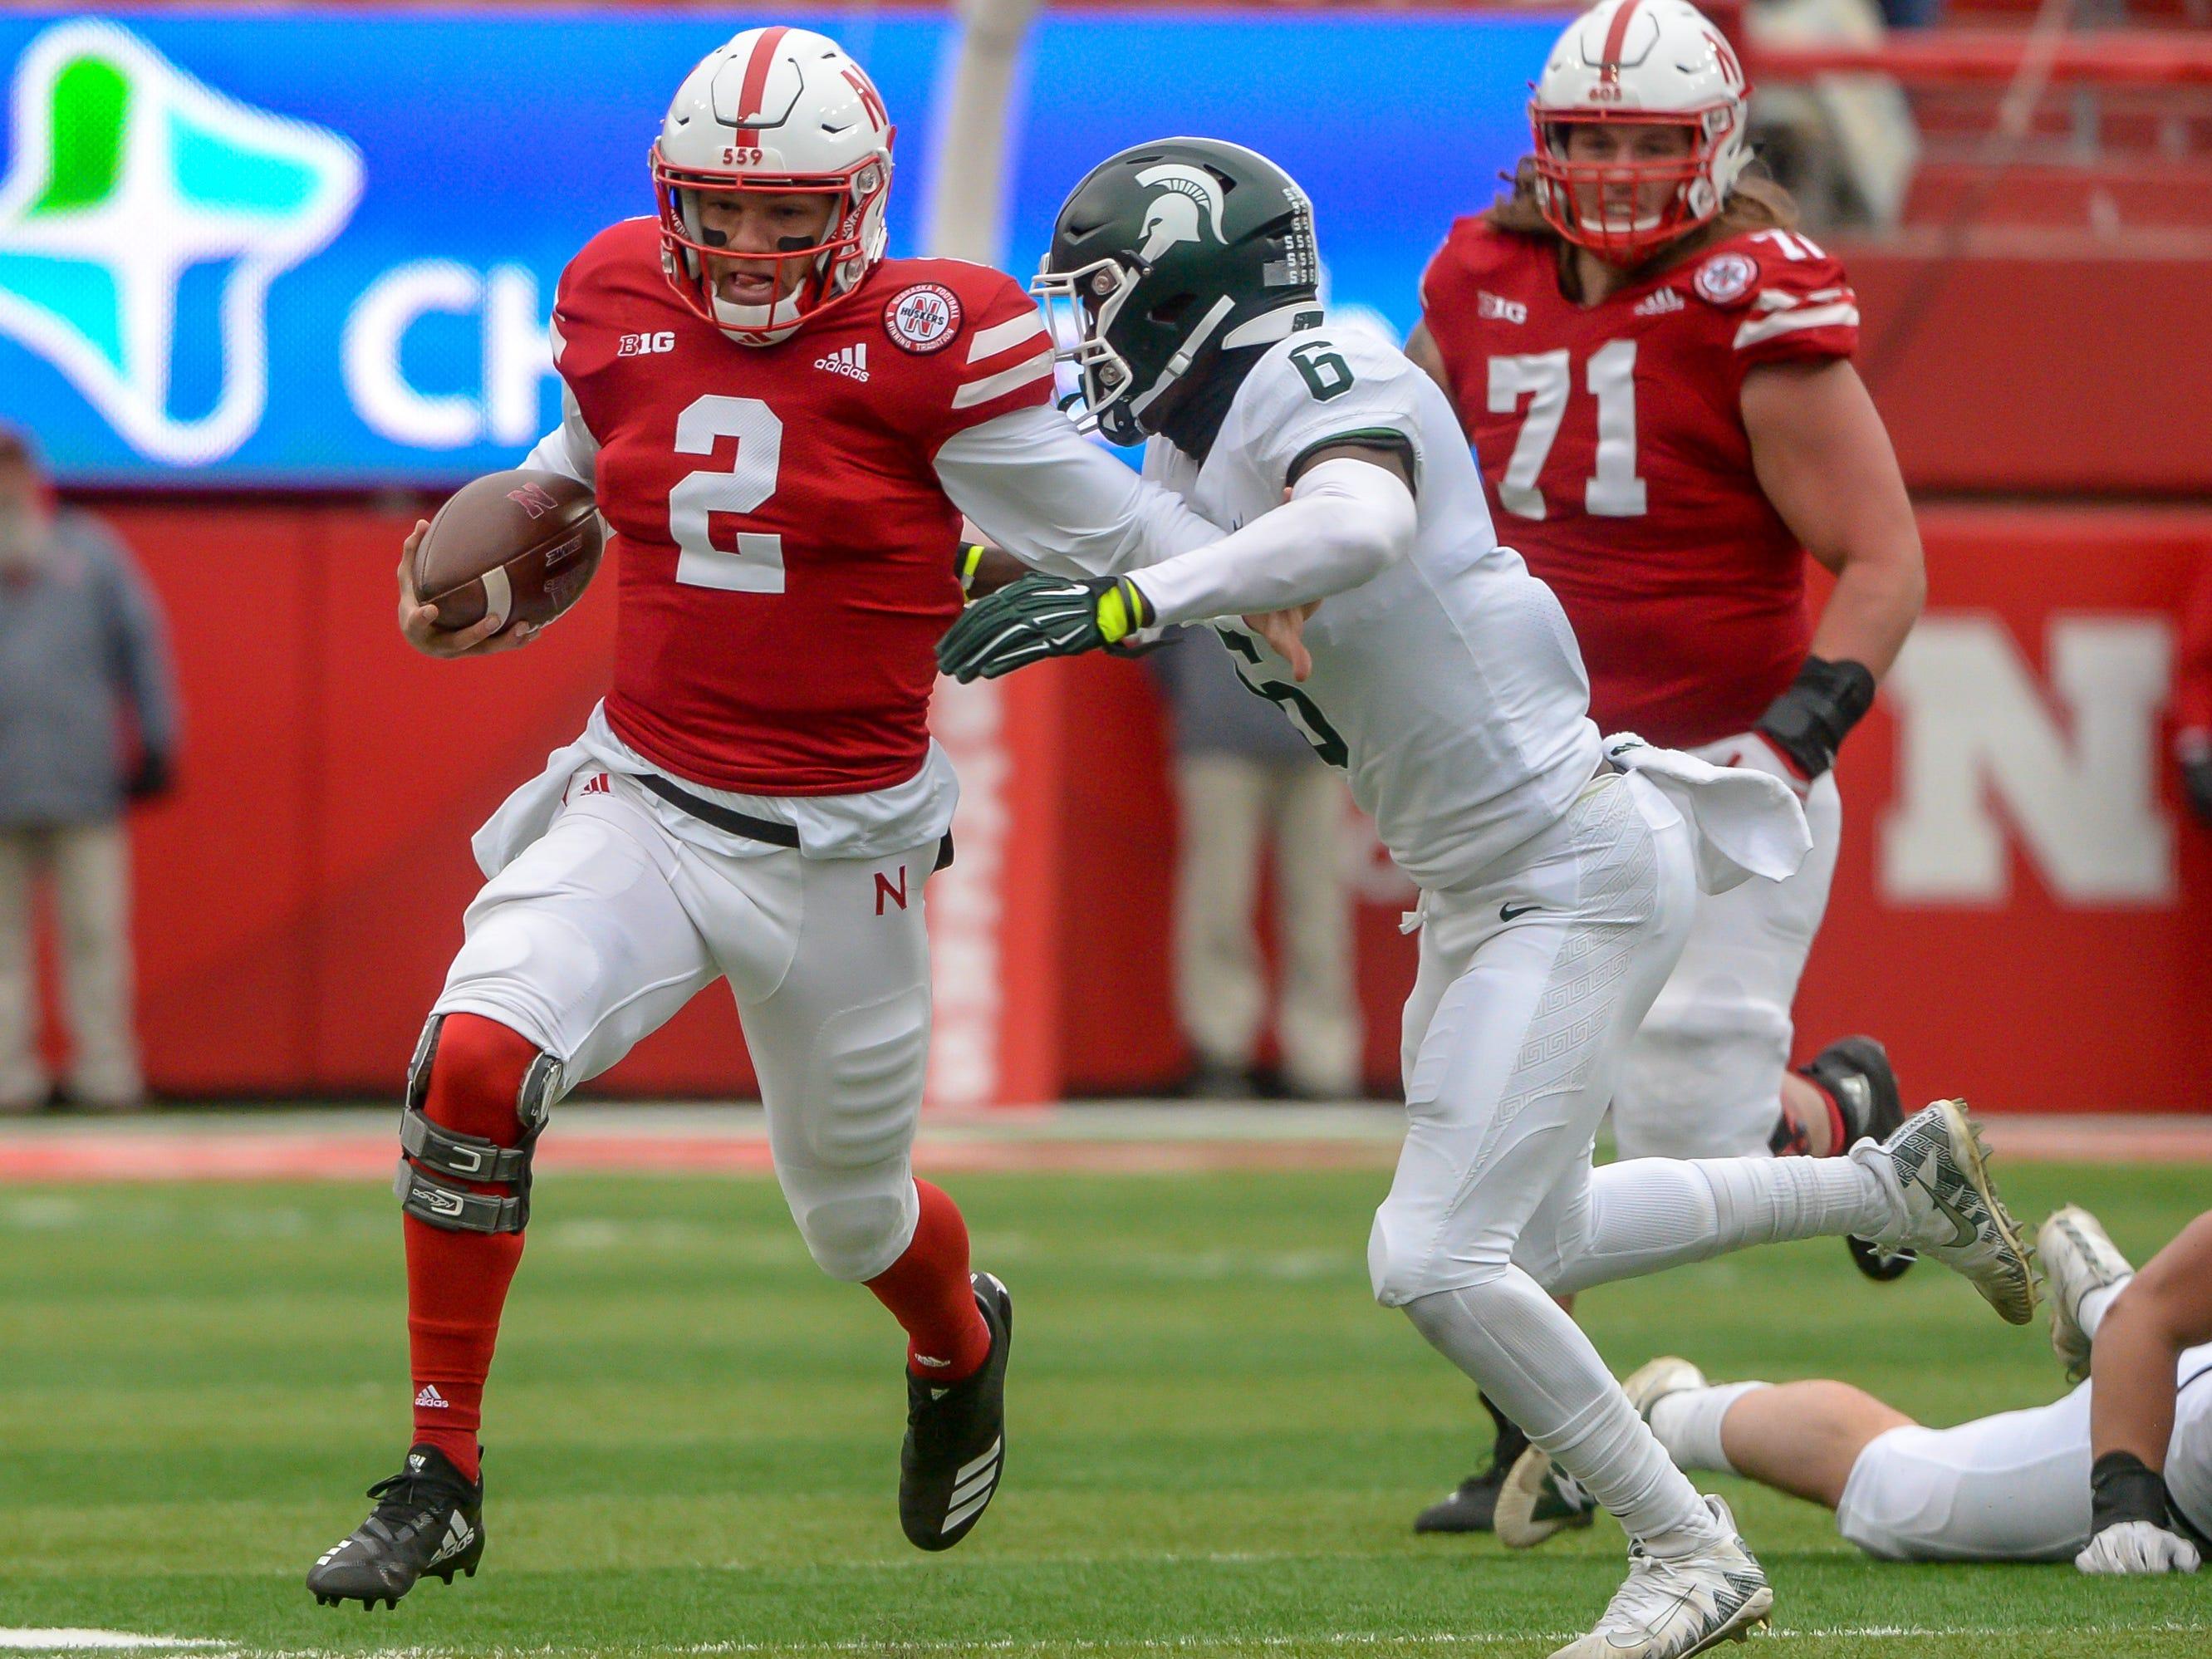 Nebraska quarterback Adrian Martinez runs against Michigan State safety David Dowell in the first half.